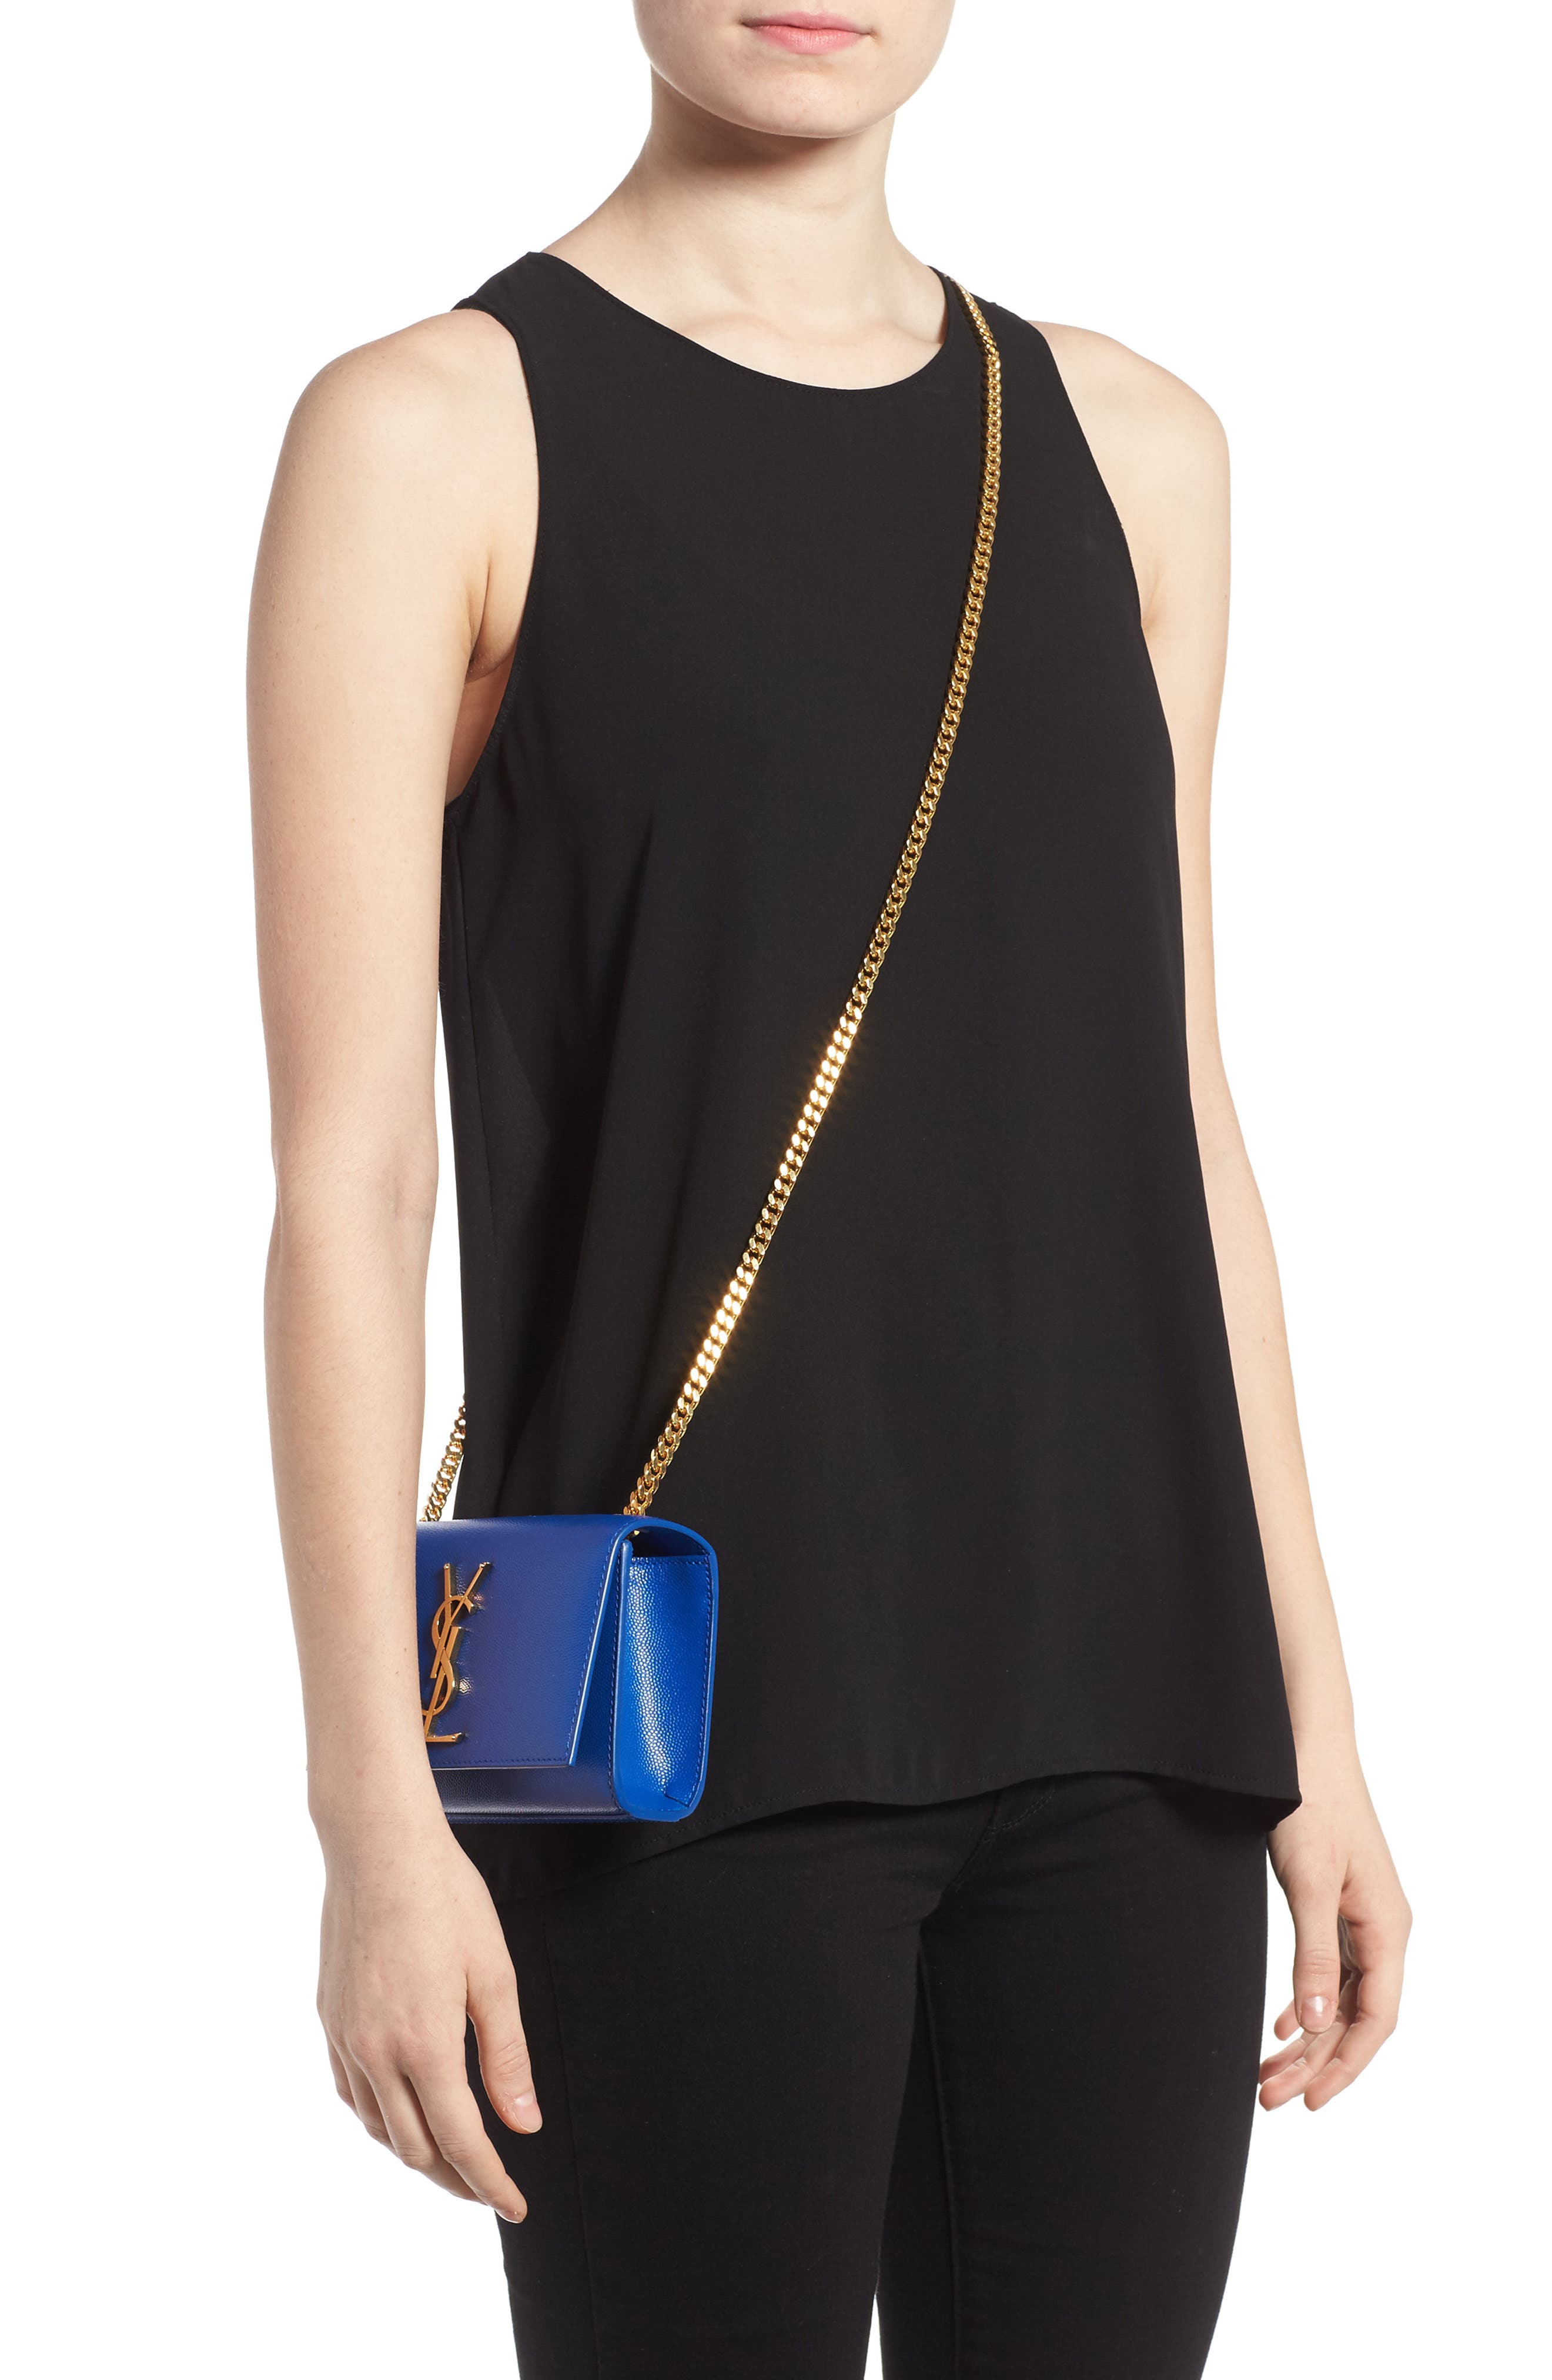 SAINT LAURENT, Small Kate Chain Crossbody Bag, Alternate thumbnail 2, color, ELECTRIC BLUE